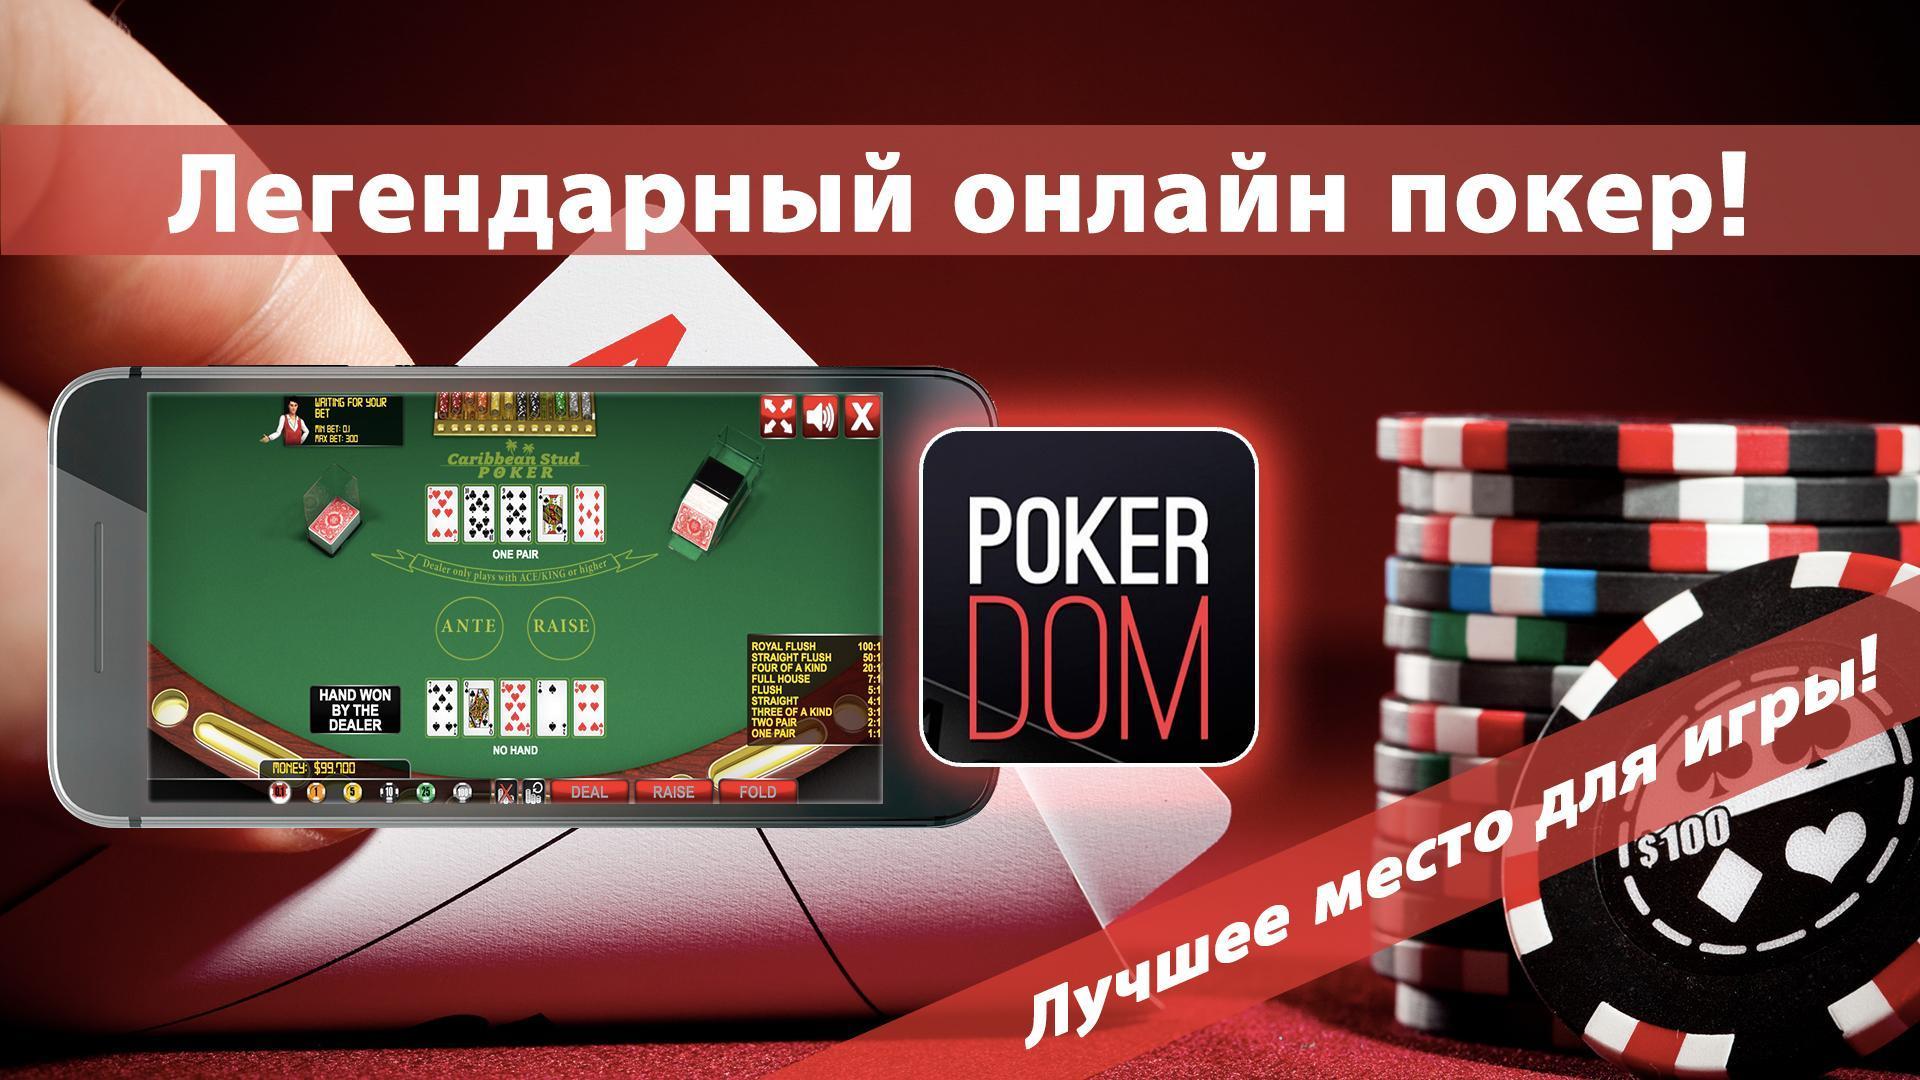 Pokerhand News